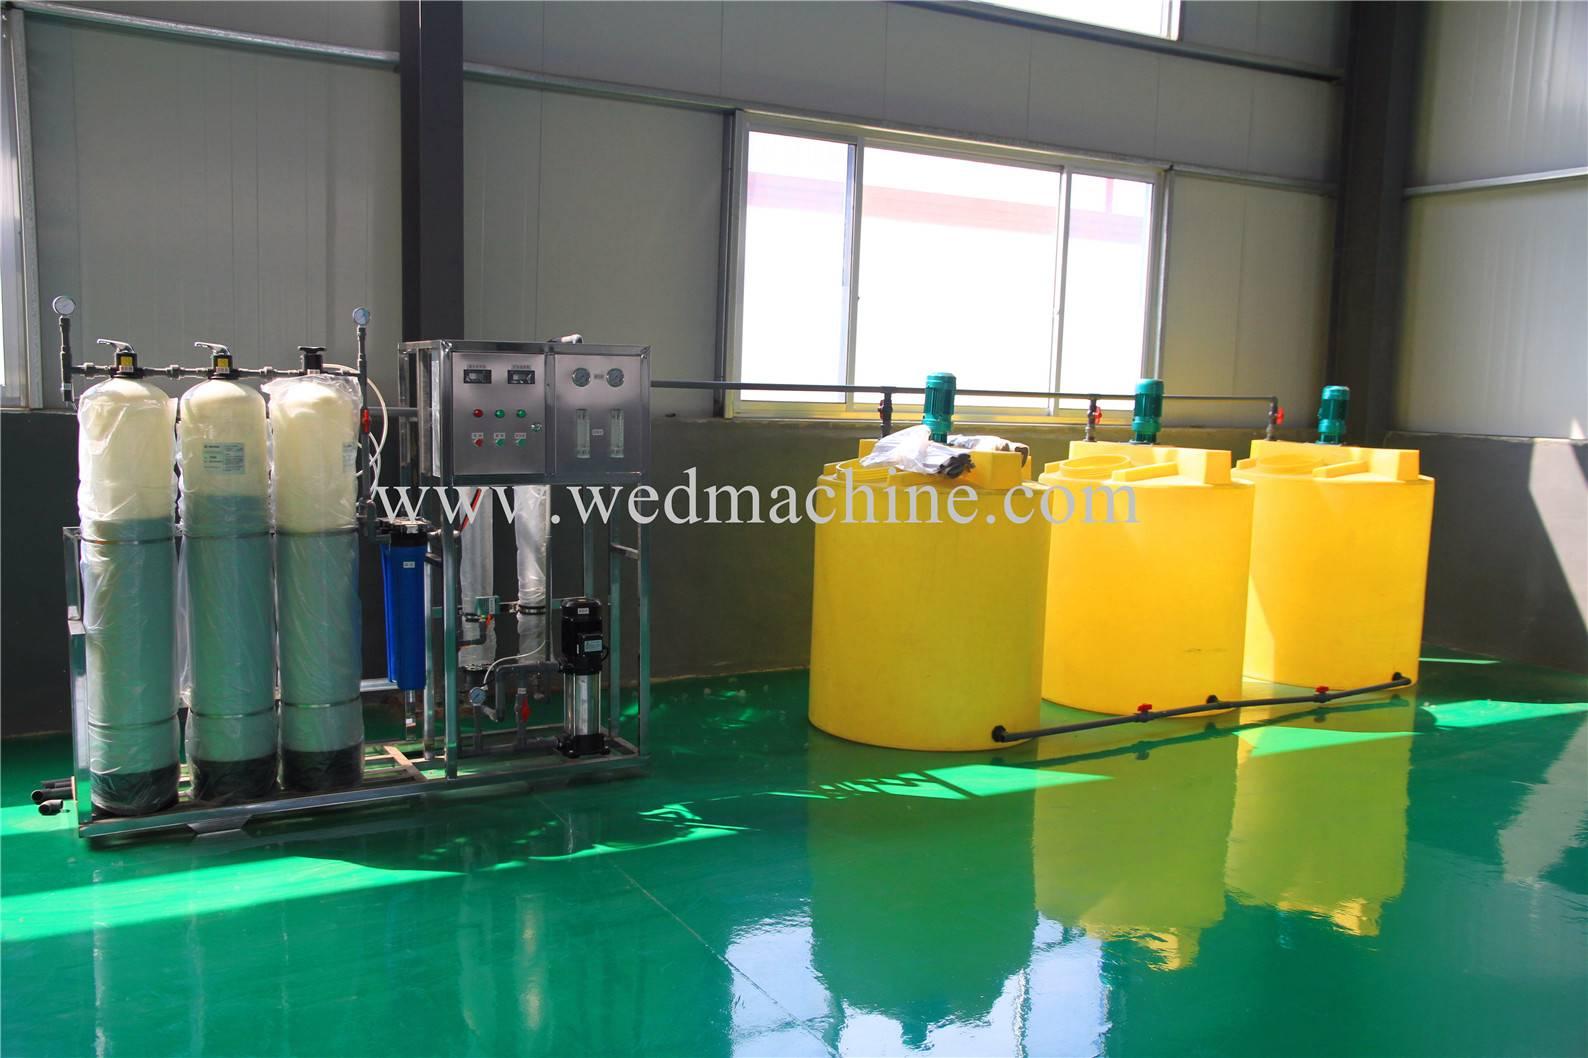 Windshield washer fluid filling machine